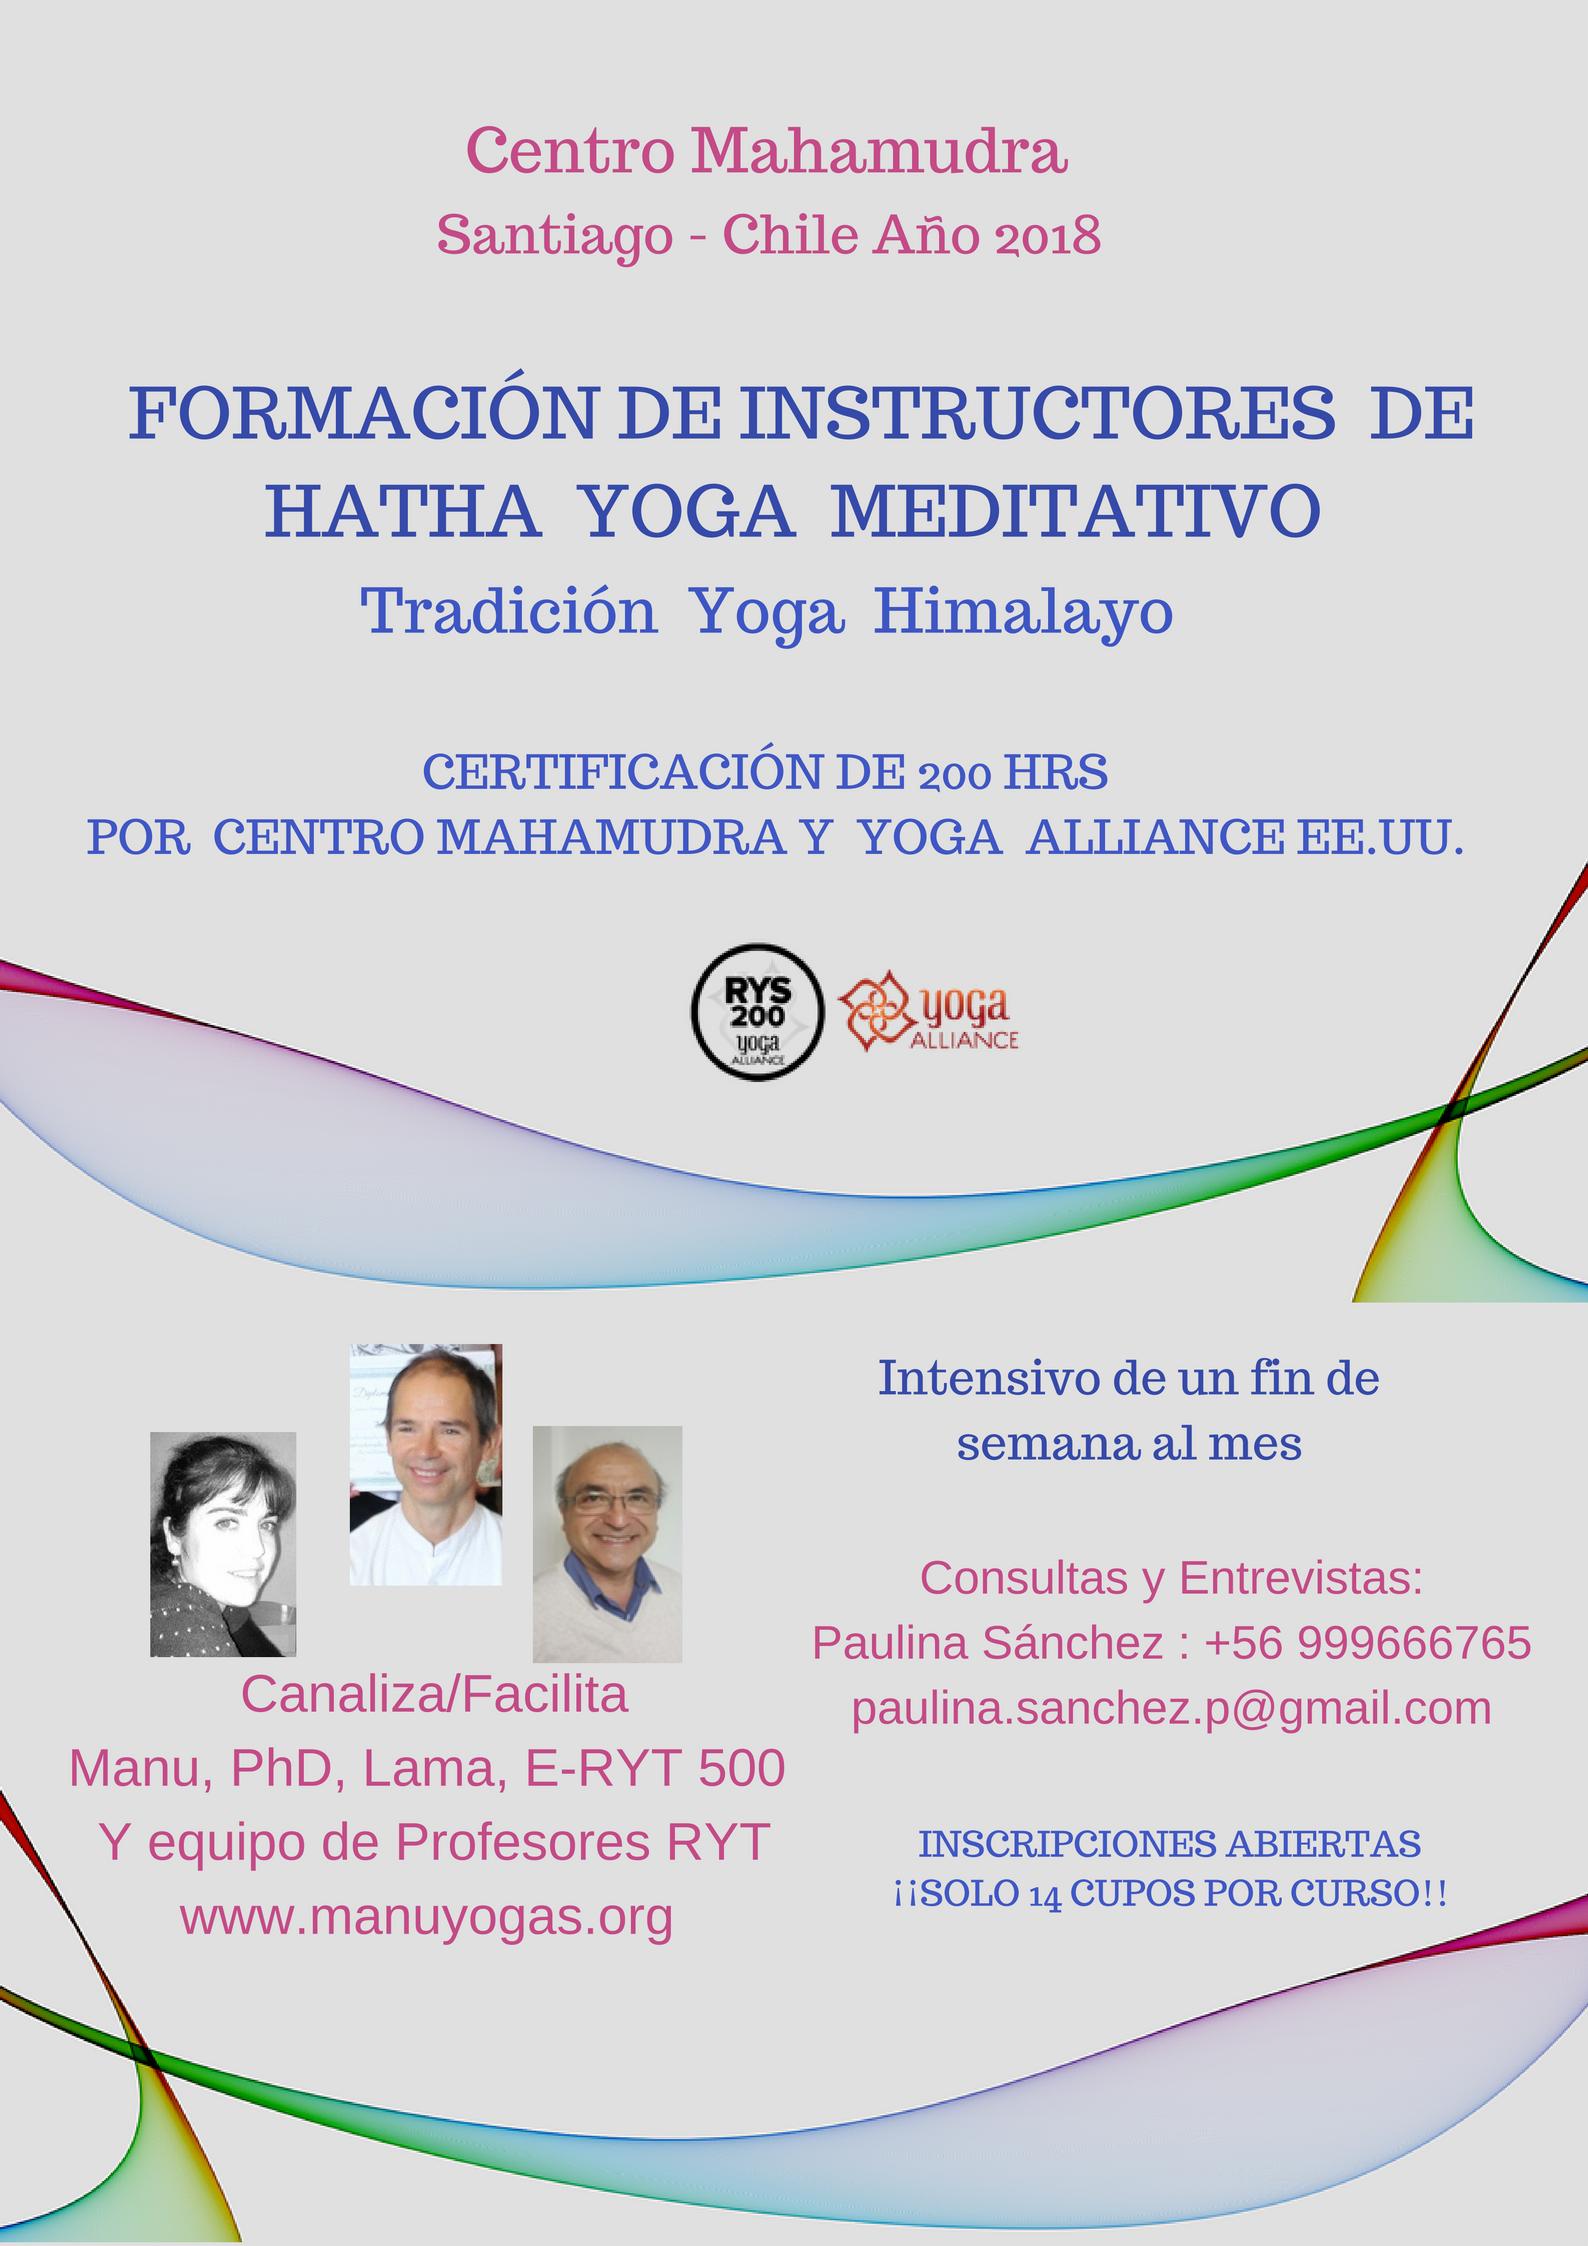 FORMACION DE INSTRUCTORES DE HATHA YOGA MEDITATIVO